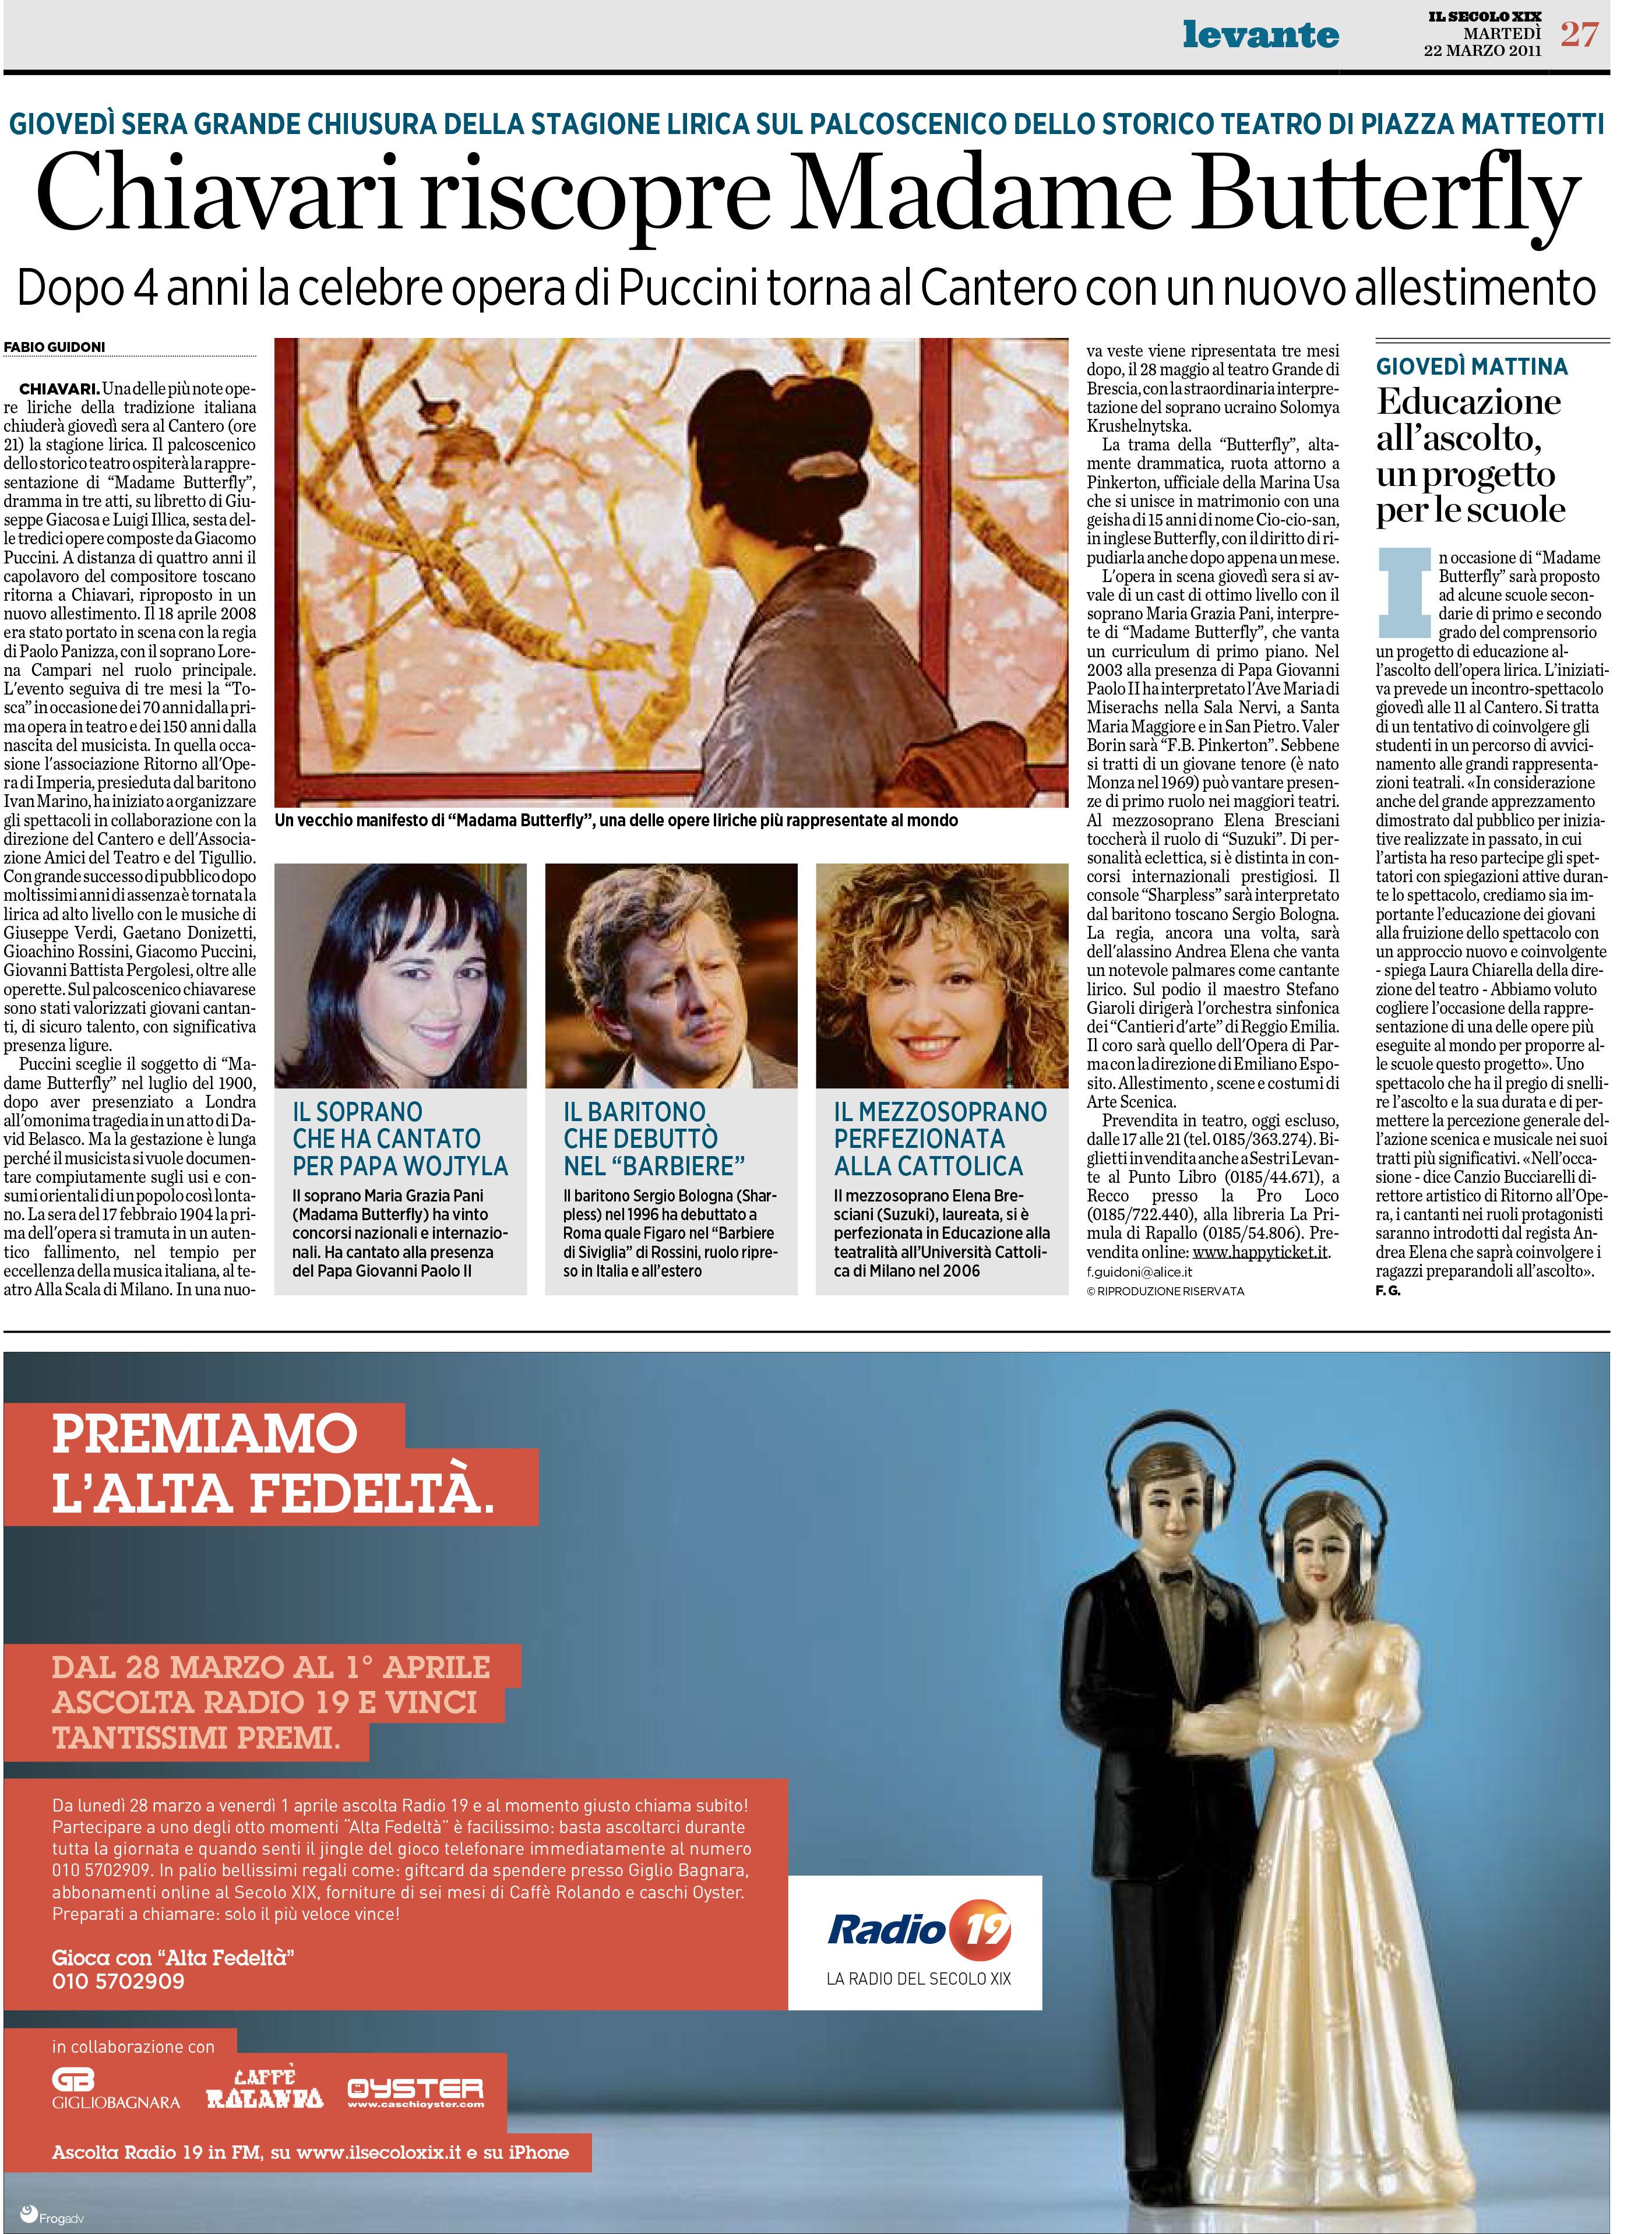 22.03.2011 – IL SECOLO XIX – Madama Butterfly